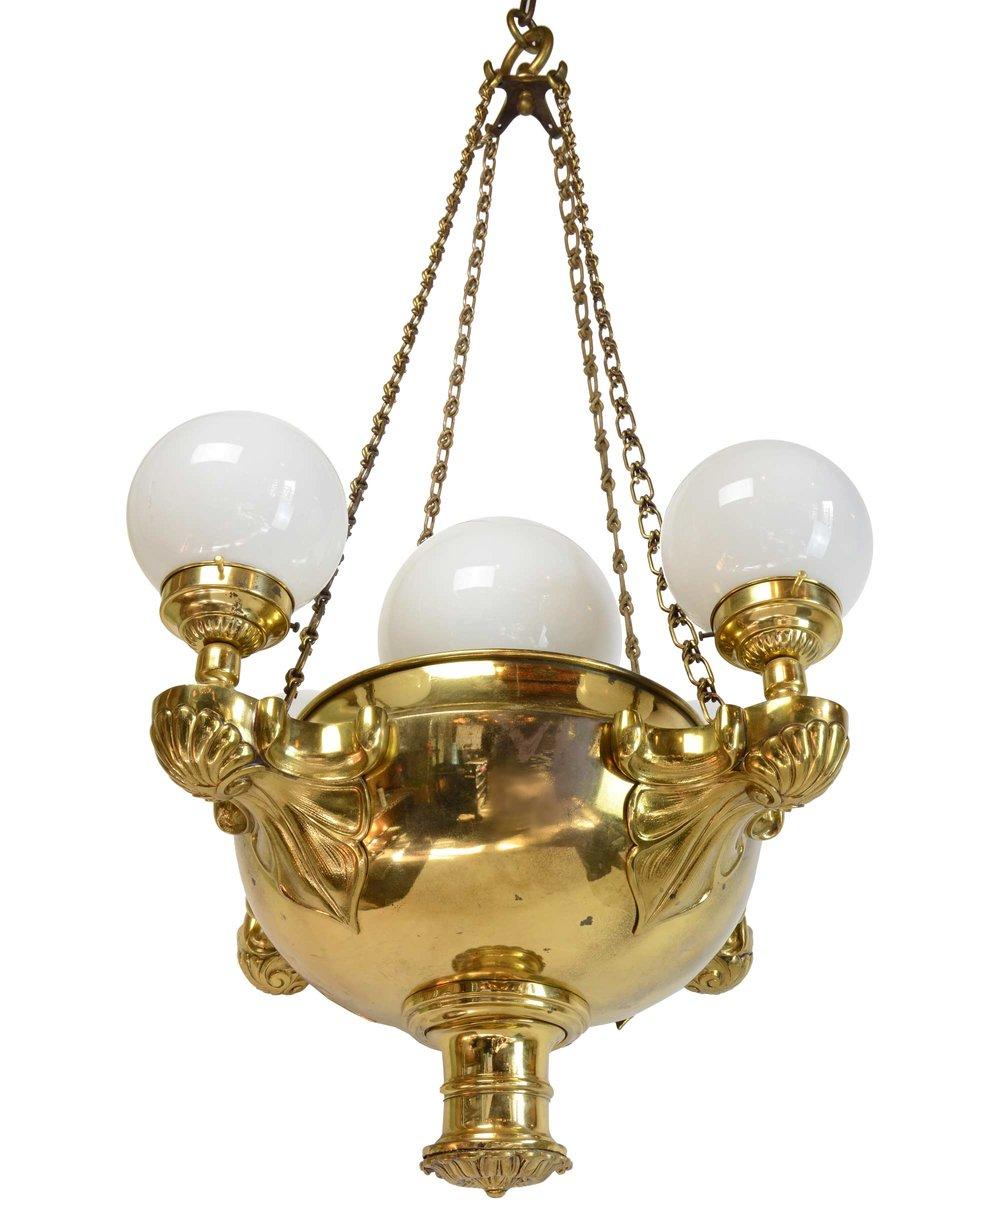 46608-polished-brass-5-light-chandelier-with-globes-bottom.jpg